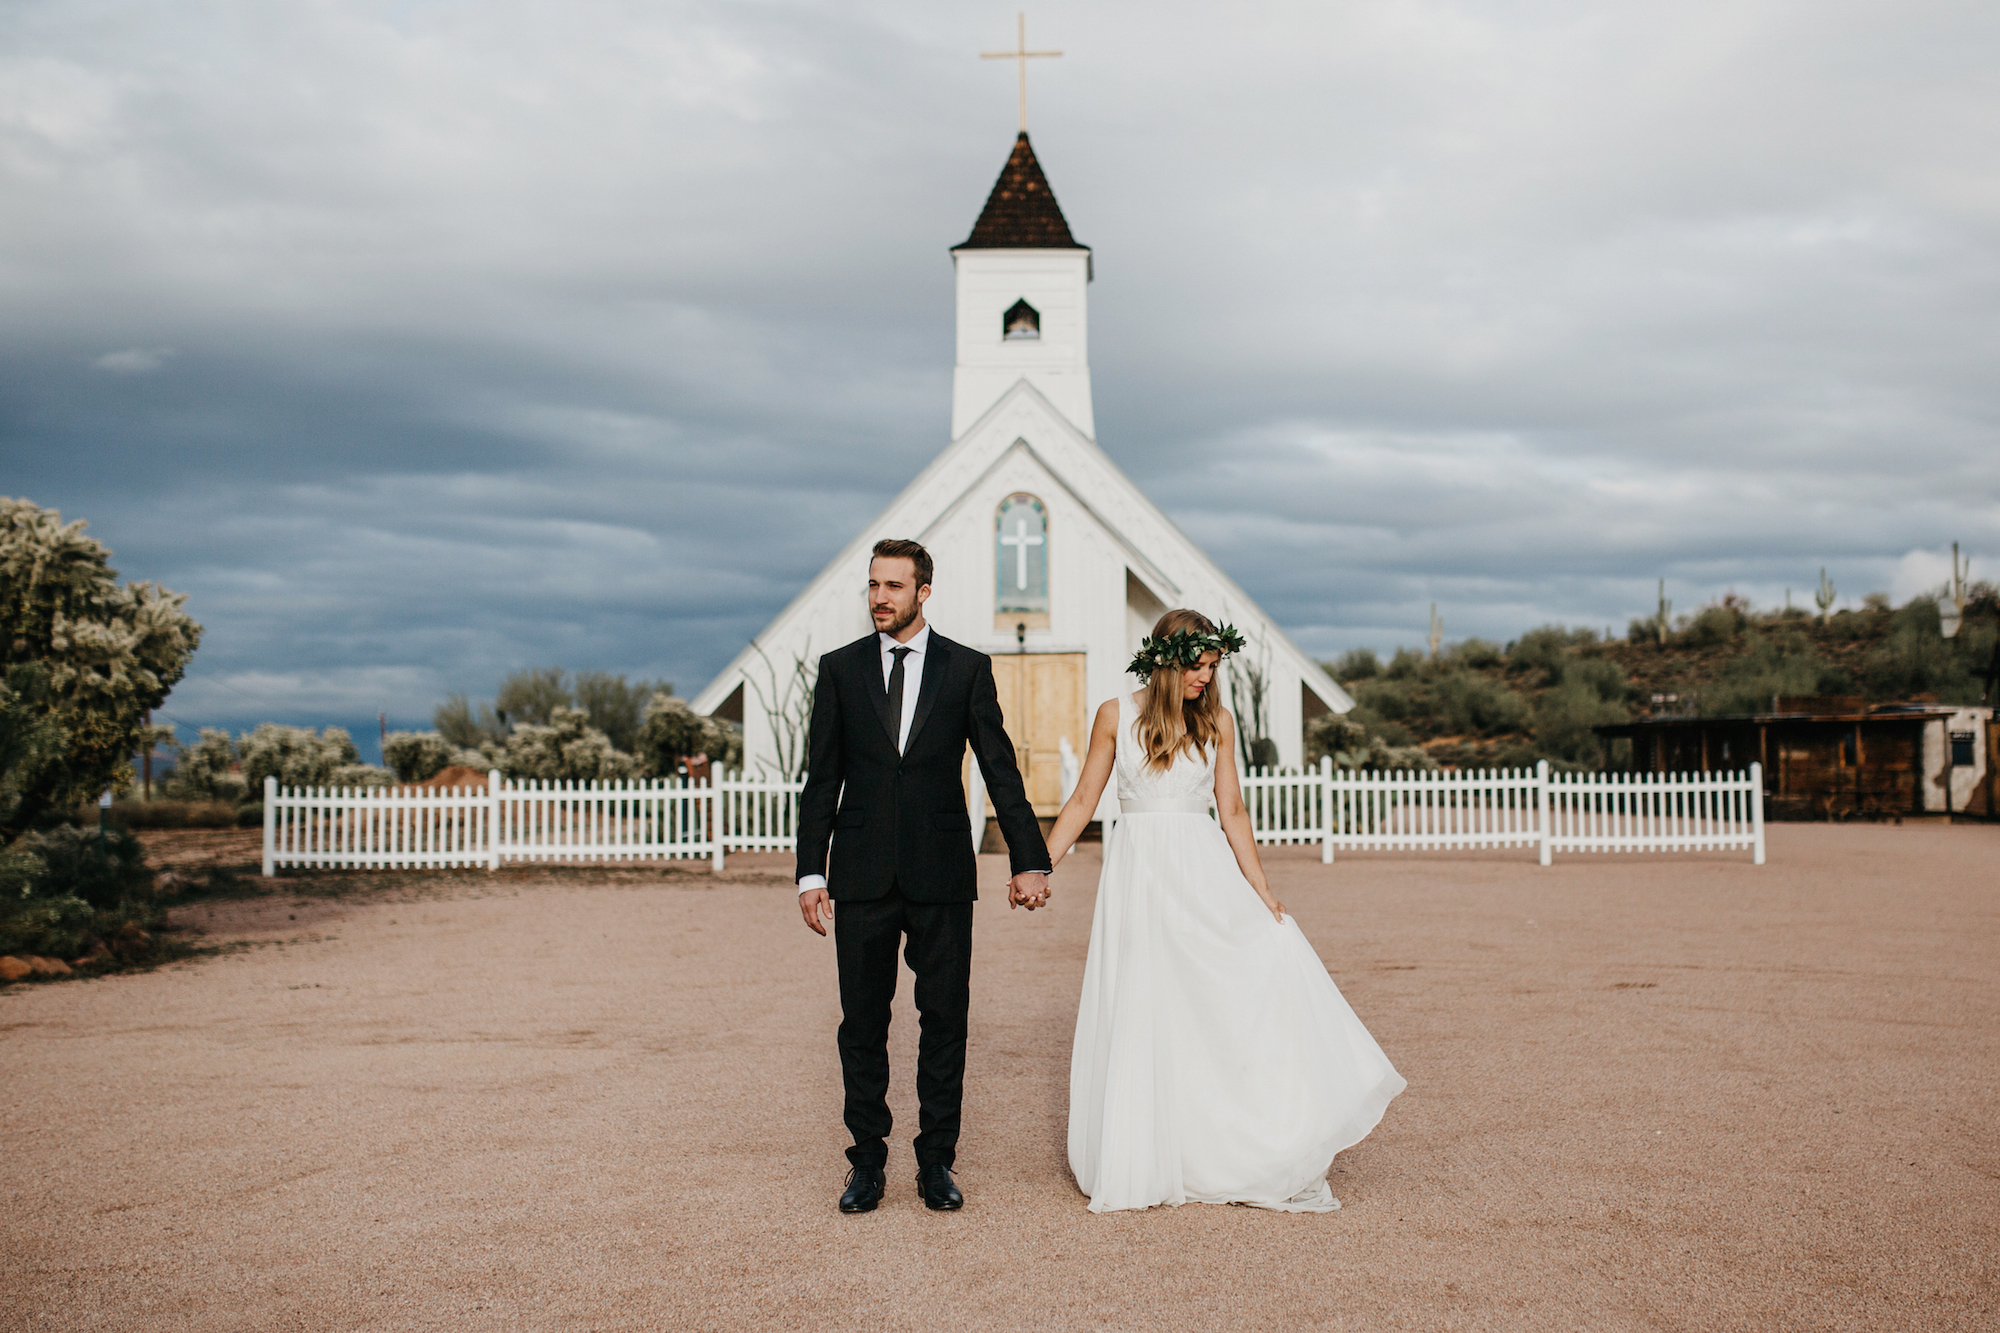 arizona - wedding - photographer712.jpg